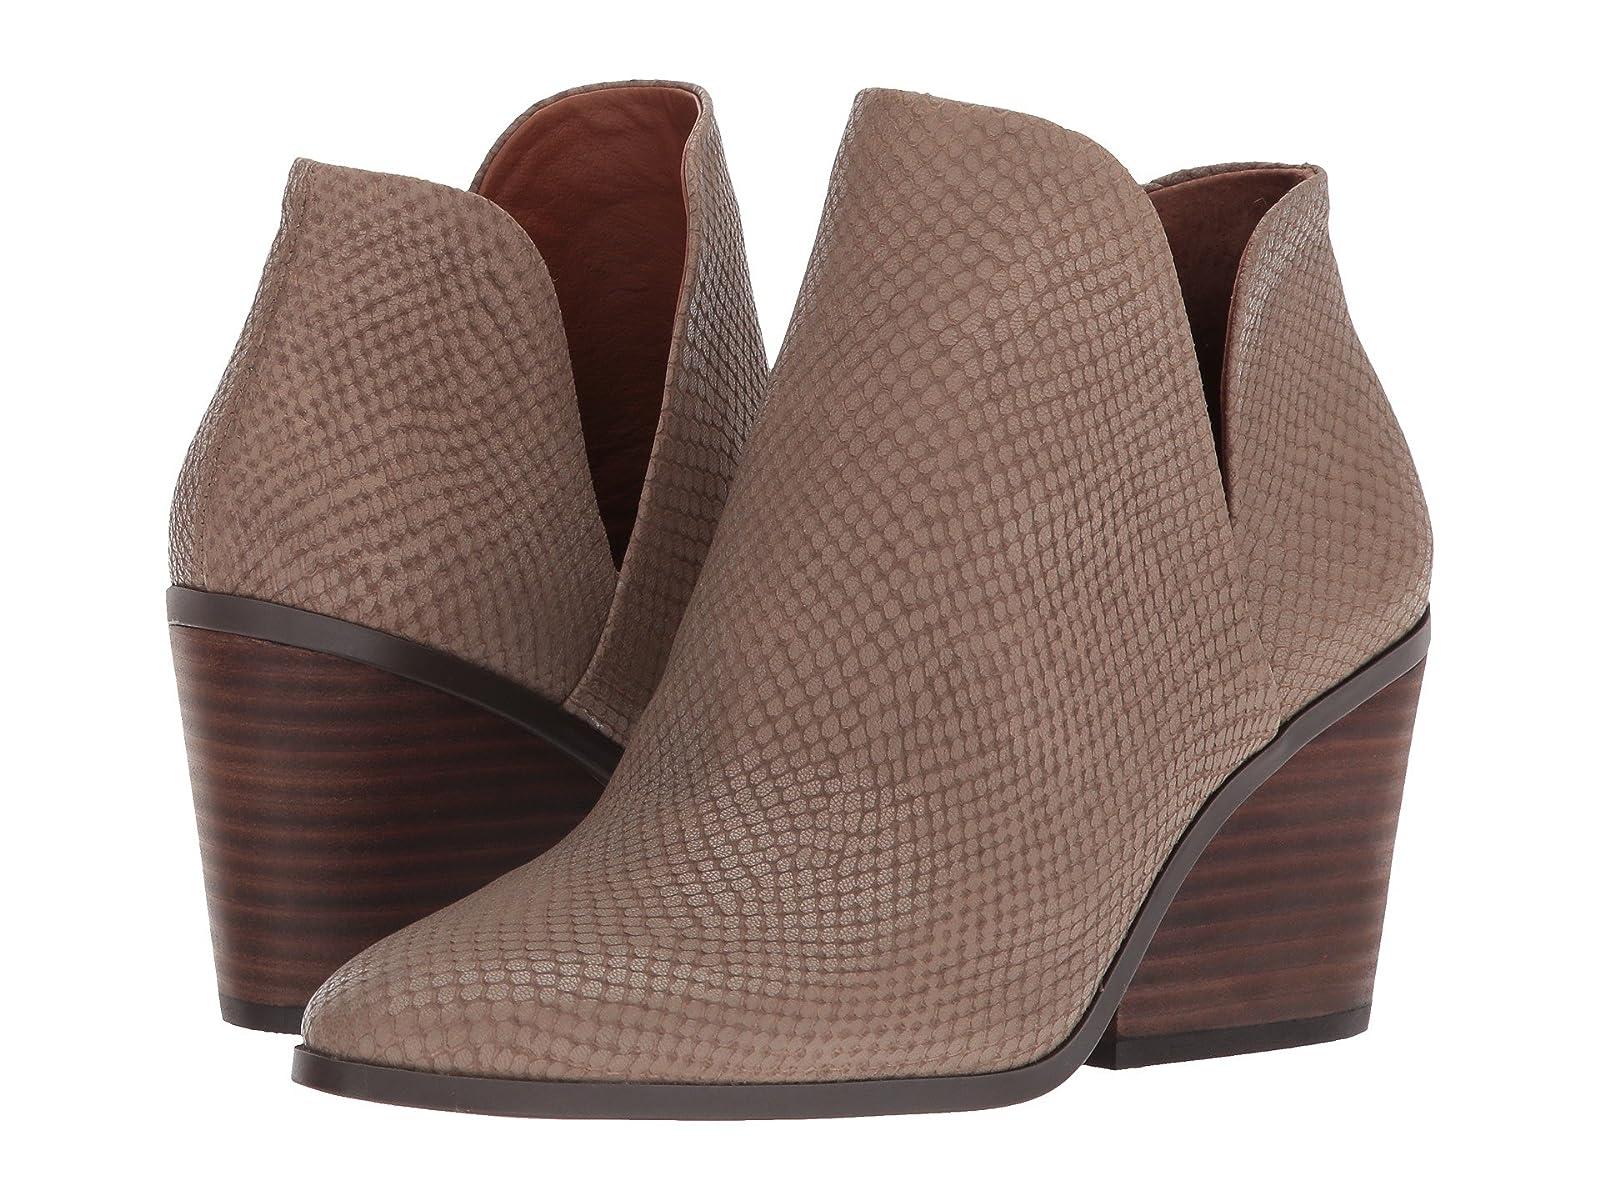 Lucky Brand LezzleeCheap and distinctive eye-catching shoes